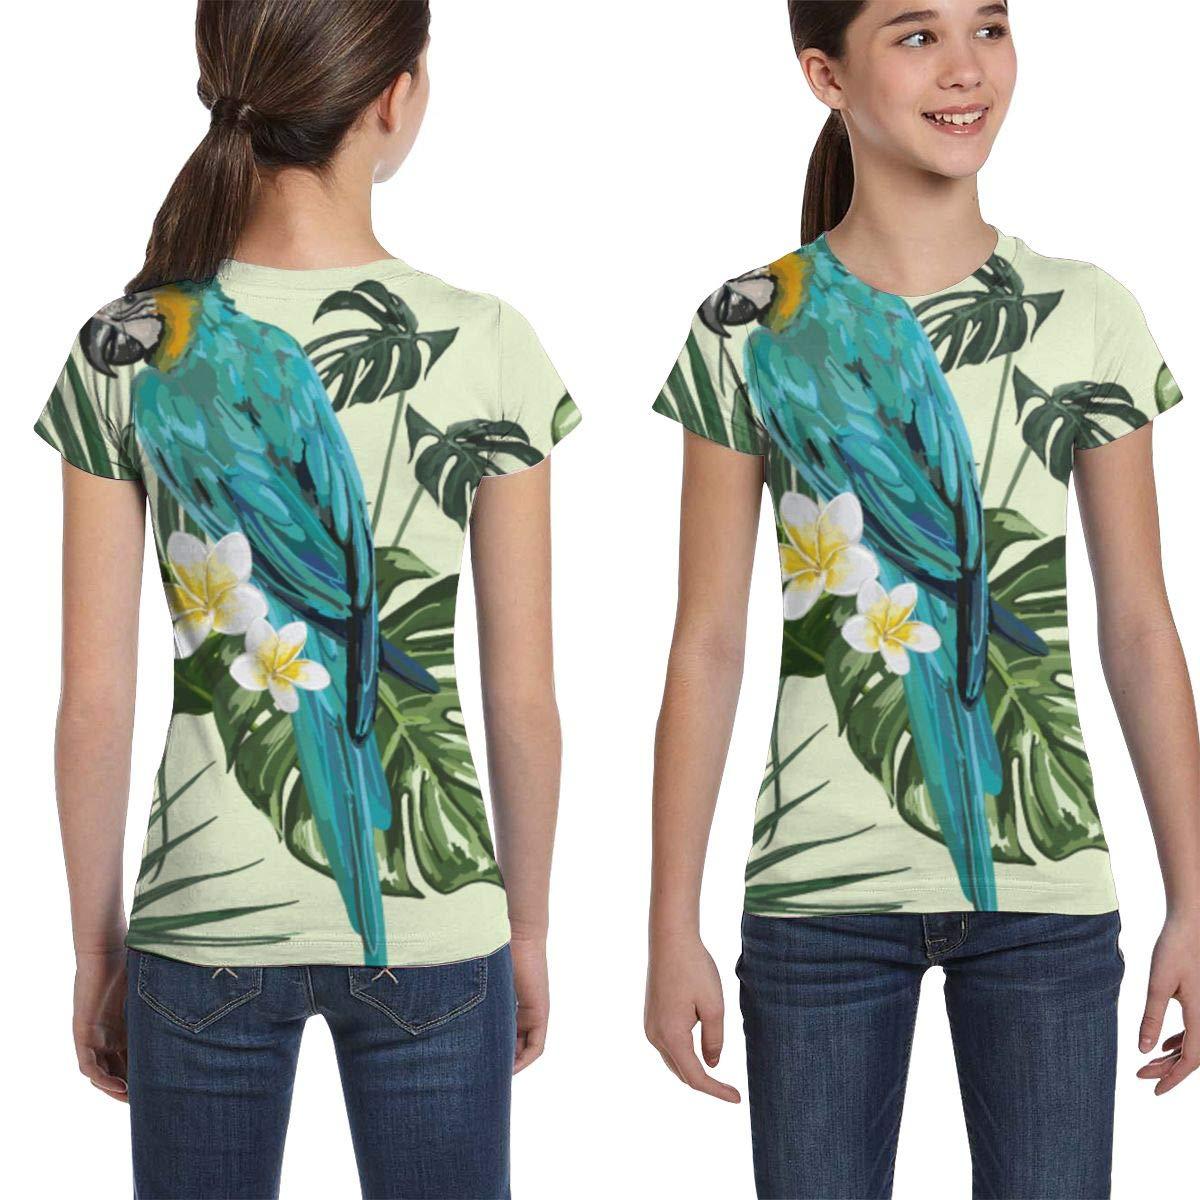 Casual Tunic Shirt Dress Girls Short Sleeve Parrot Palm Leaves Plumeria T-Shirts XS-XL